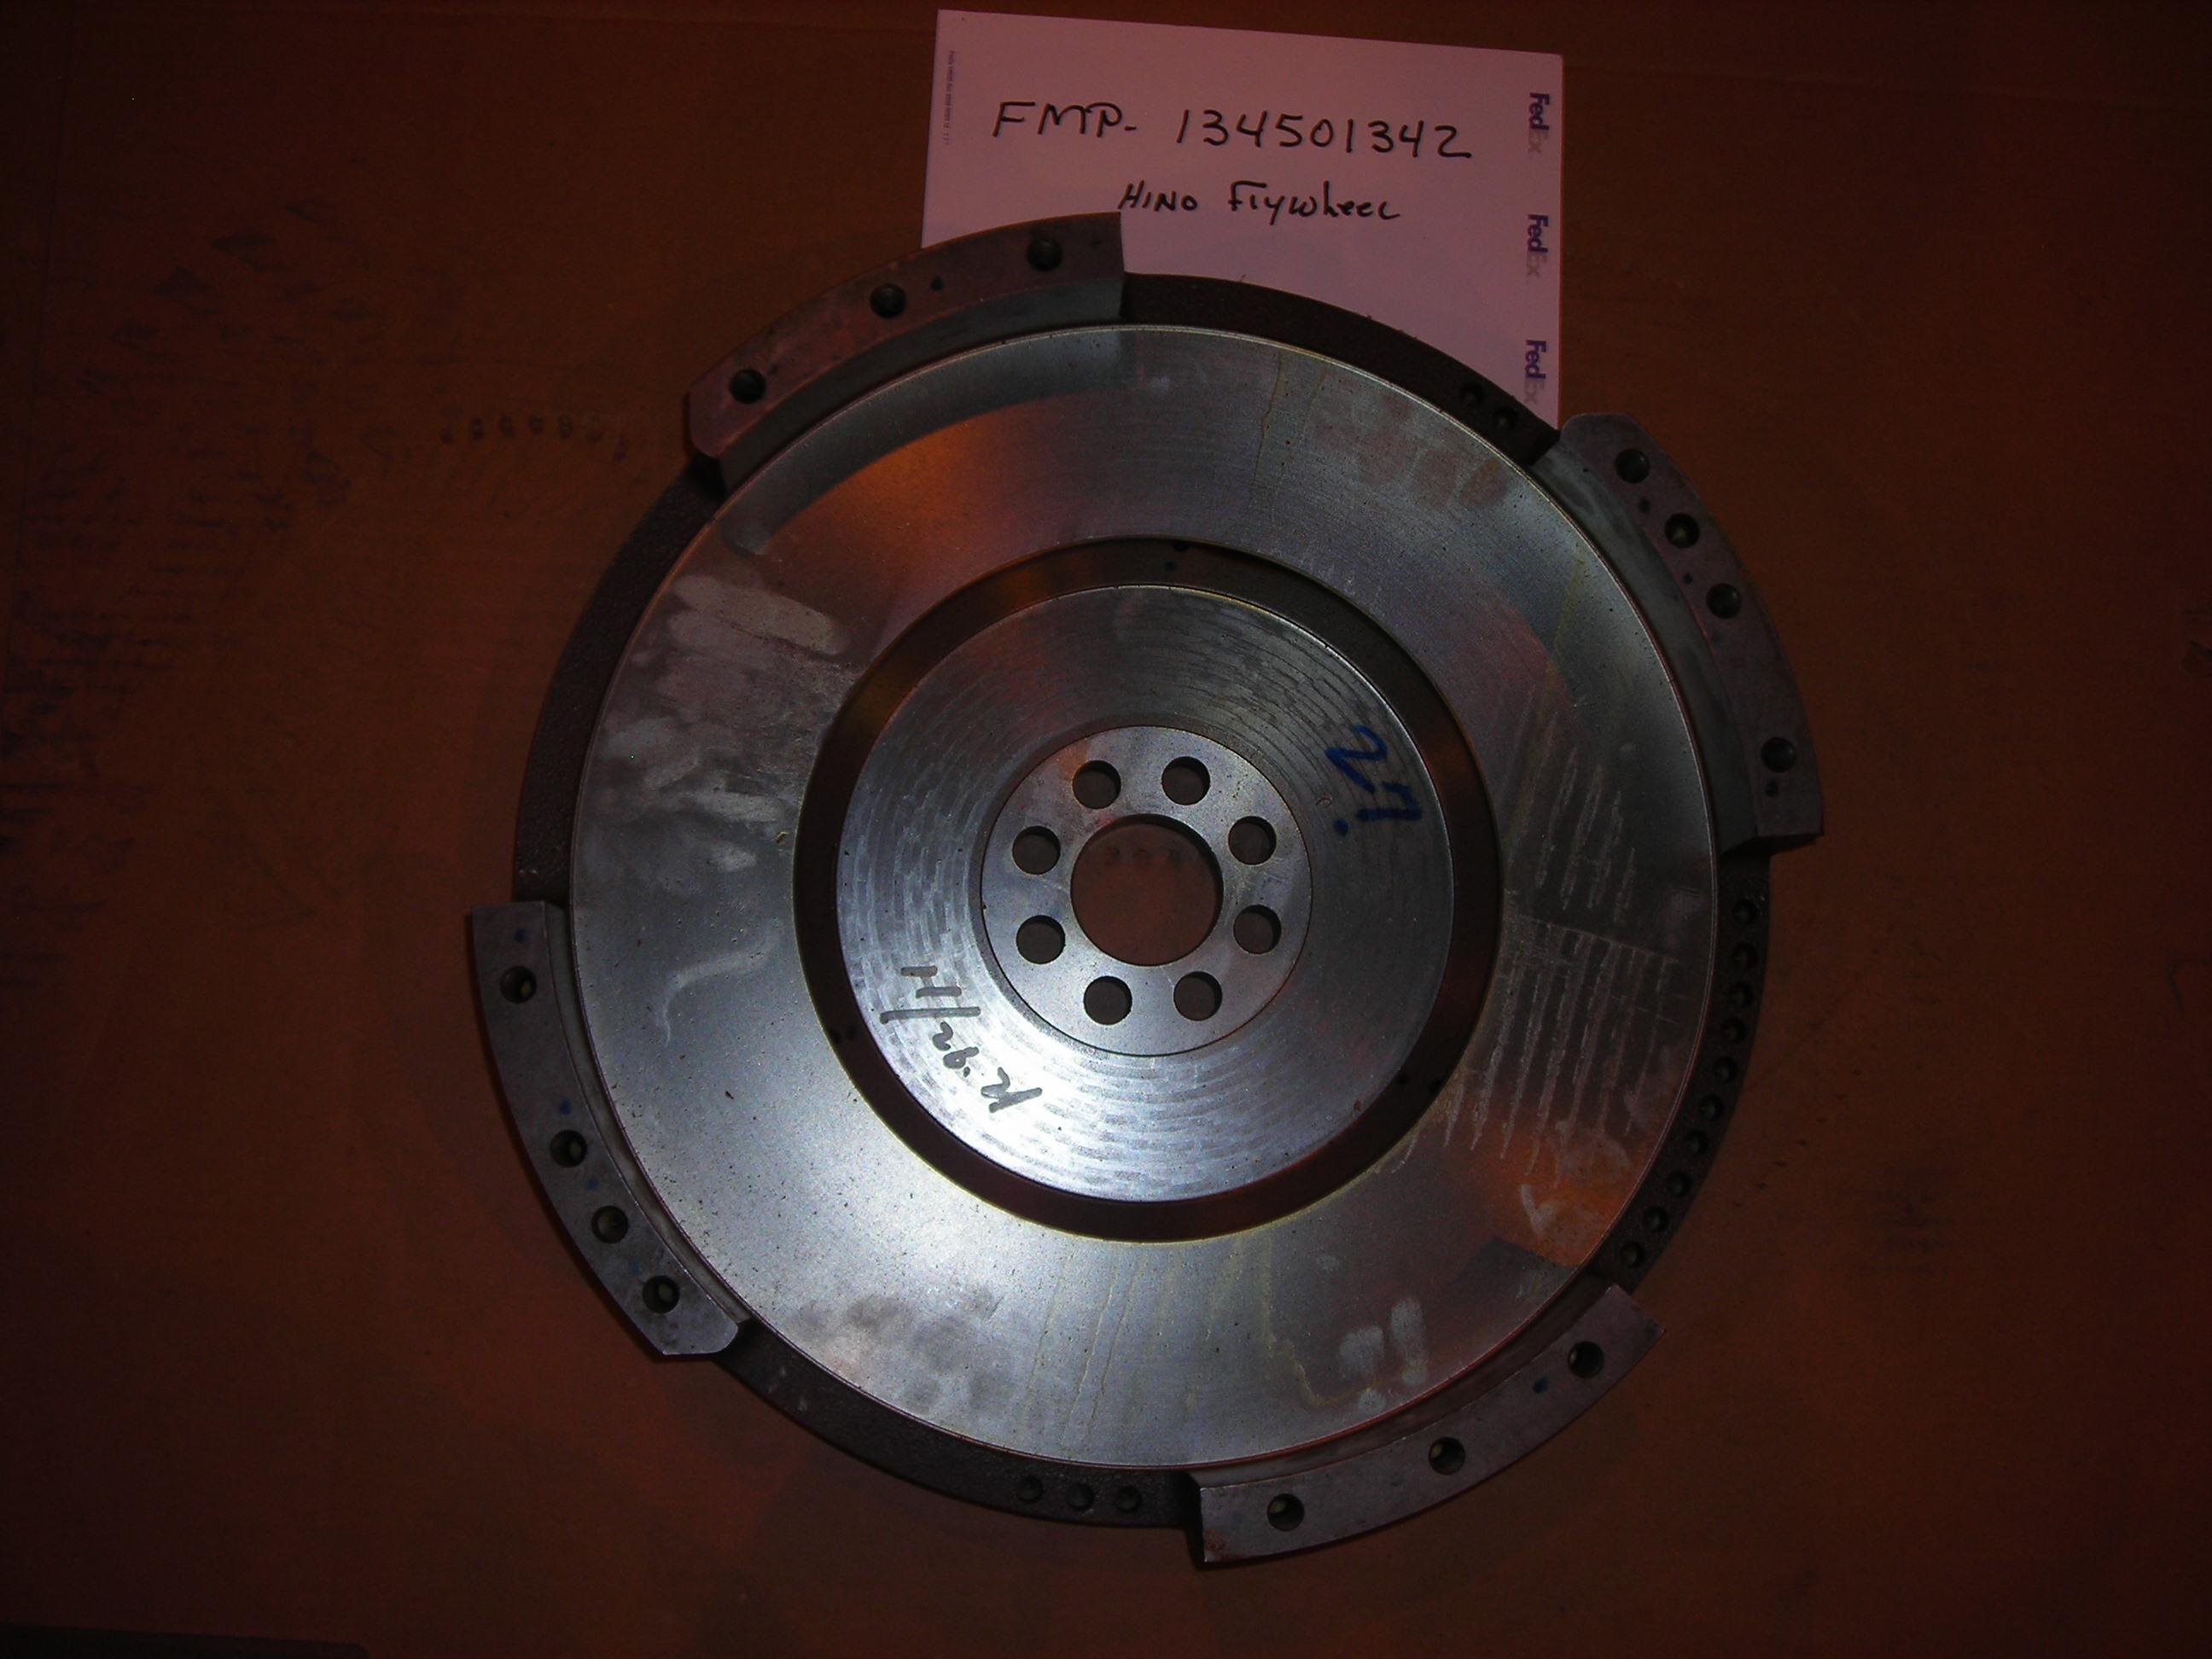 134501342 Hino Flywheel Front